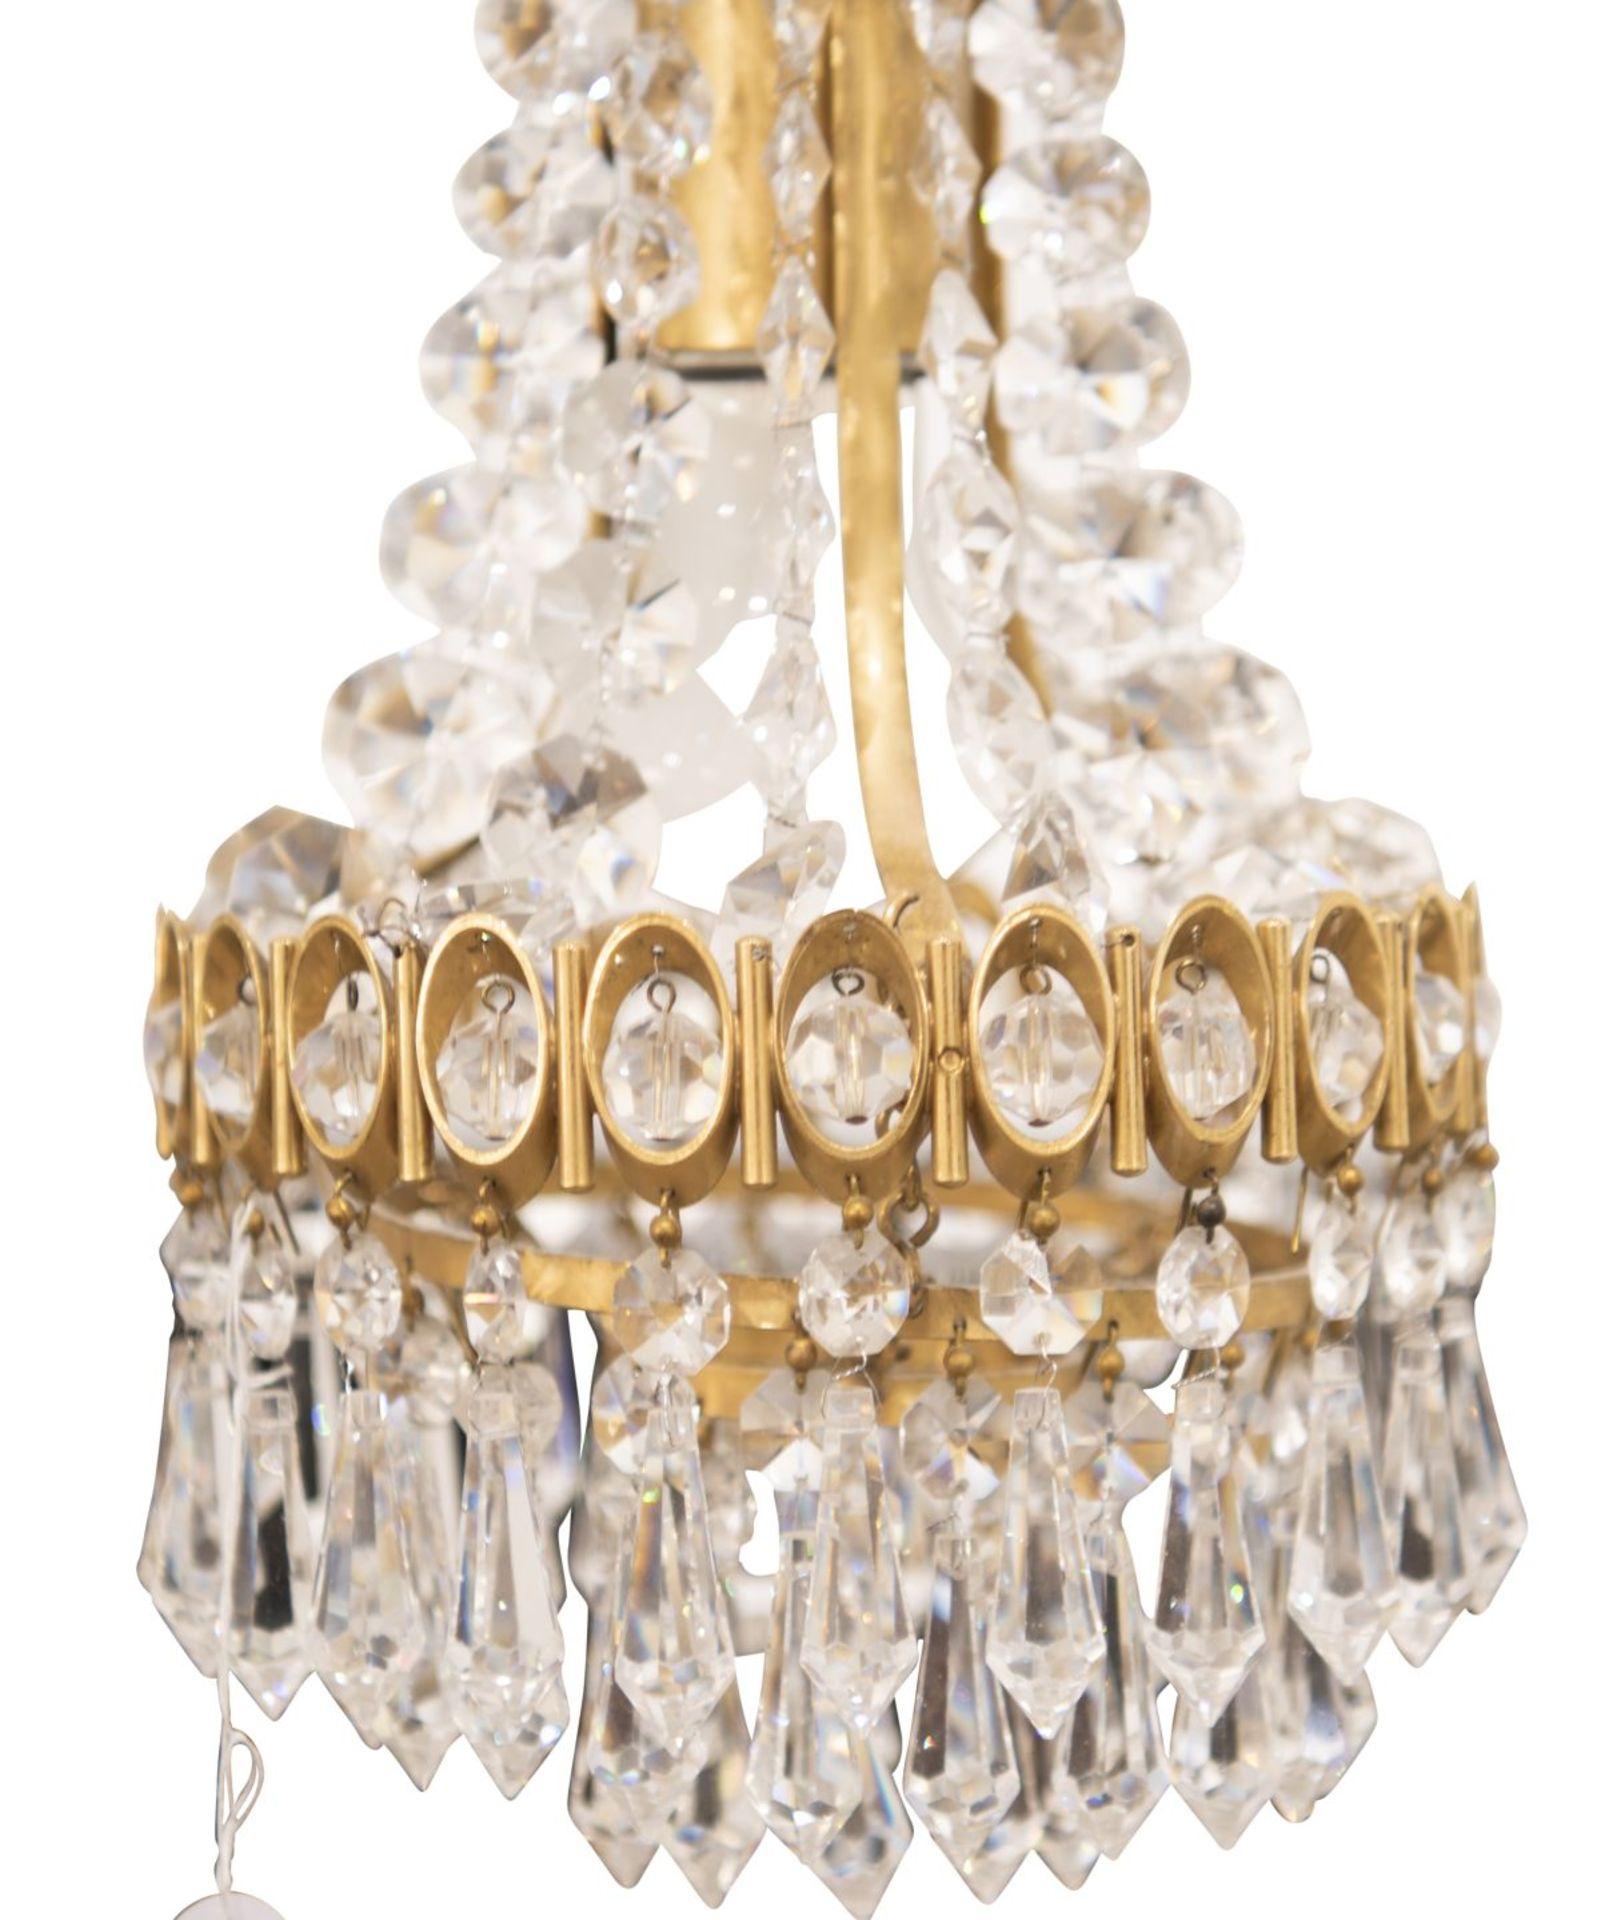 Crystal chandelier - Image 4 of 4